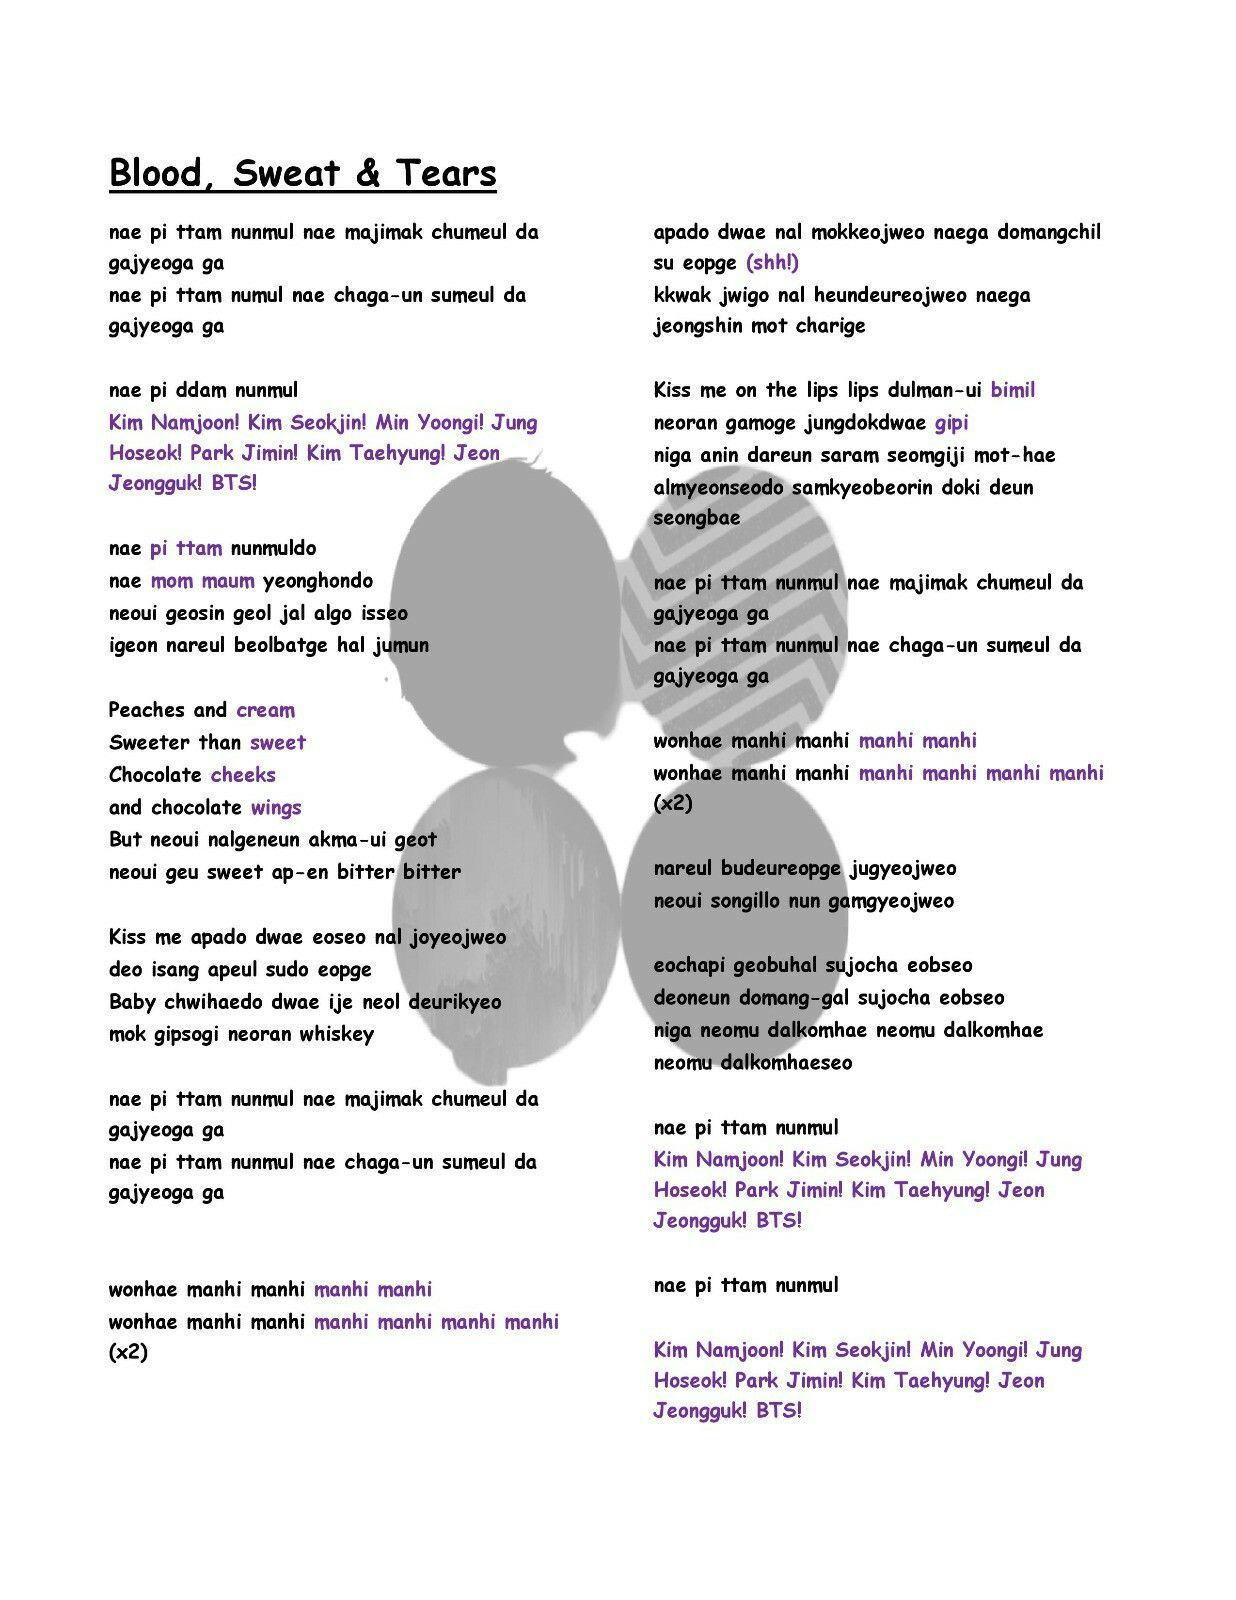 BTS:Blood Sweat And Tears Lyrics   LyricWiki   Fandom